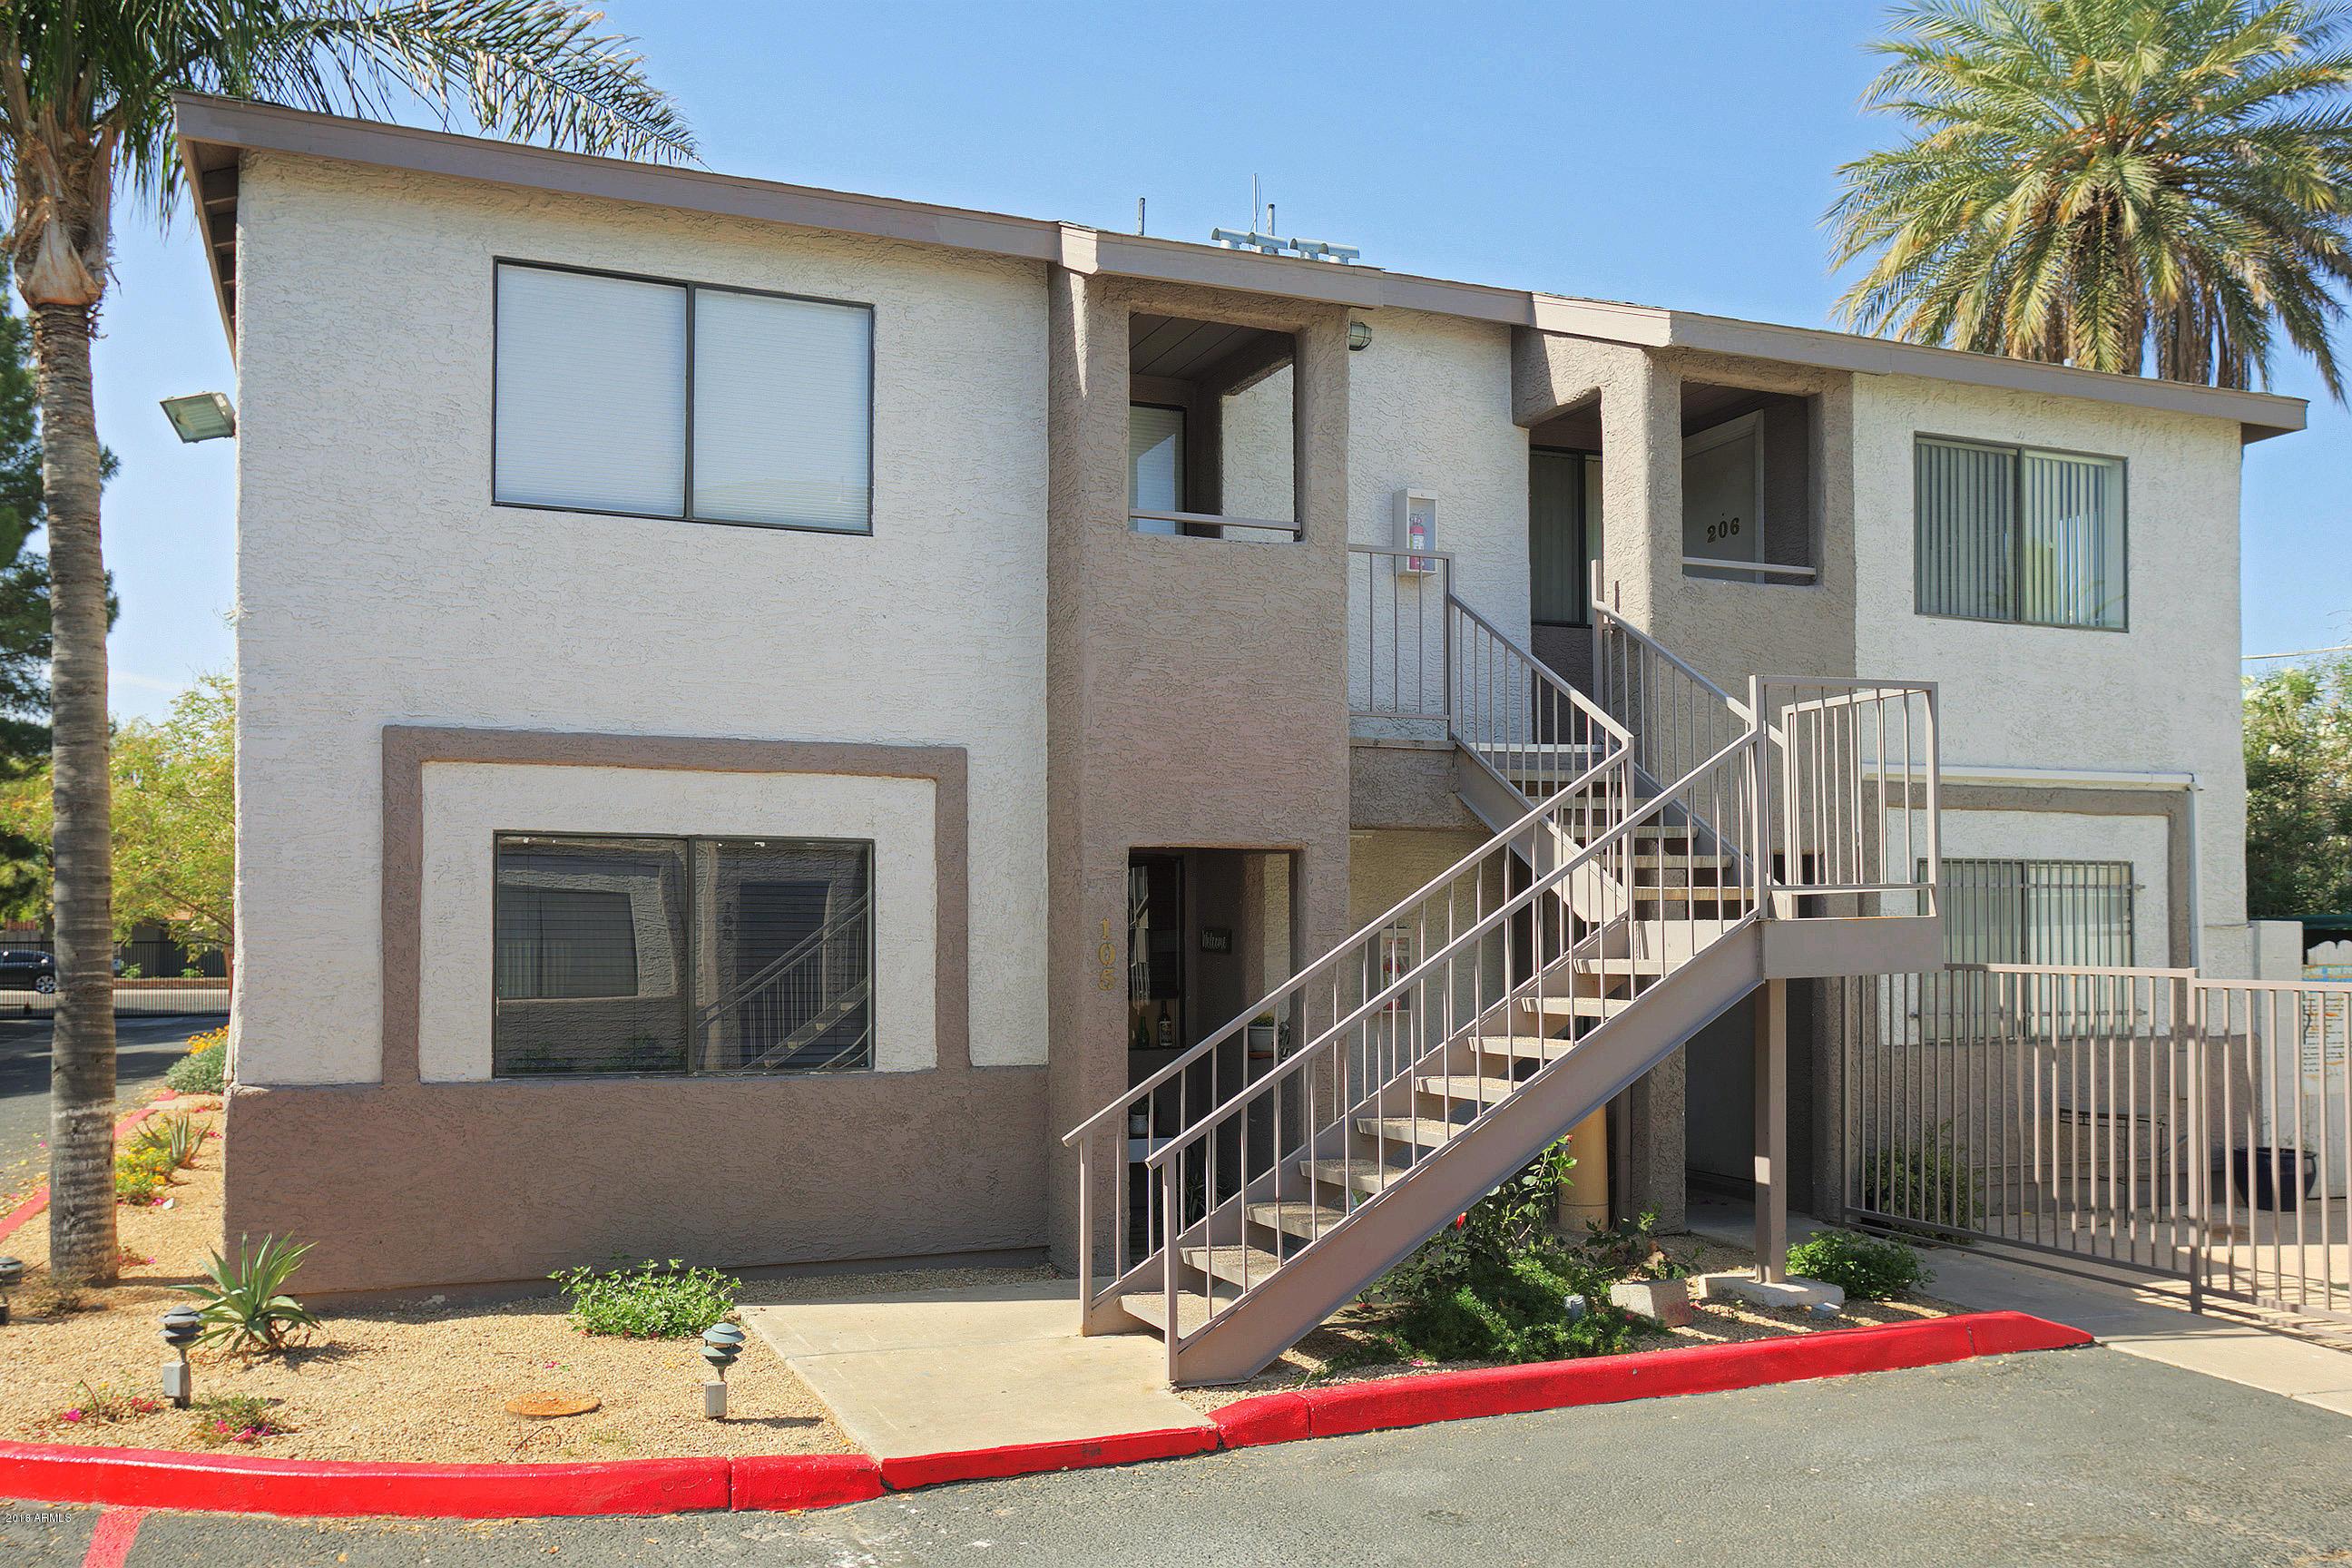 3208 E FLOWER Street, Phoenix, AZ 85018 (MLS# 5714865